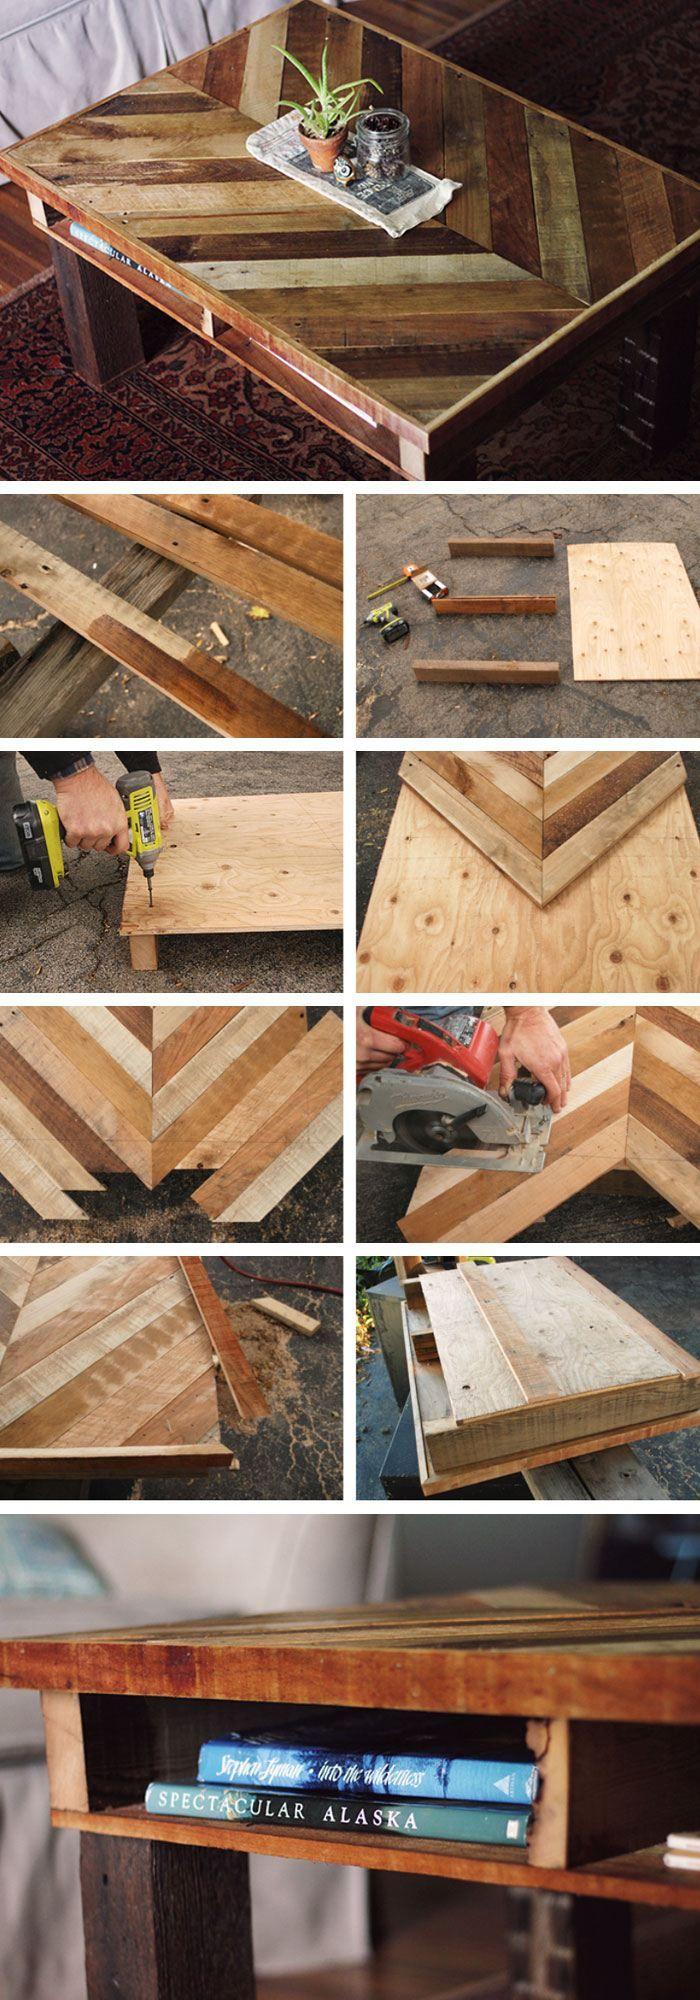 DIY Pallet Coffee Table | DIY Home Decor Ideas on a Budget | DIY Home Decorating on a Budget